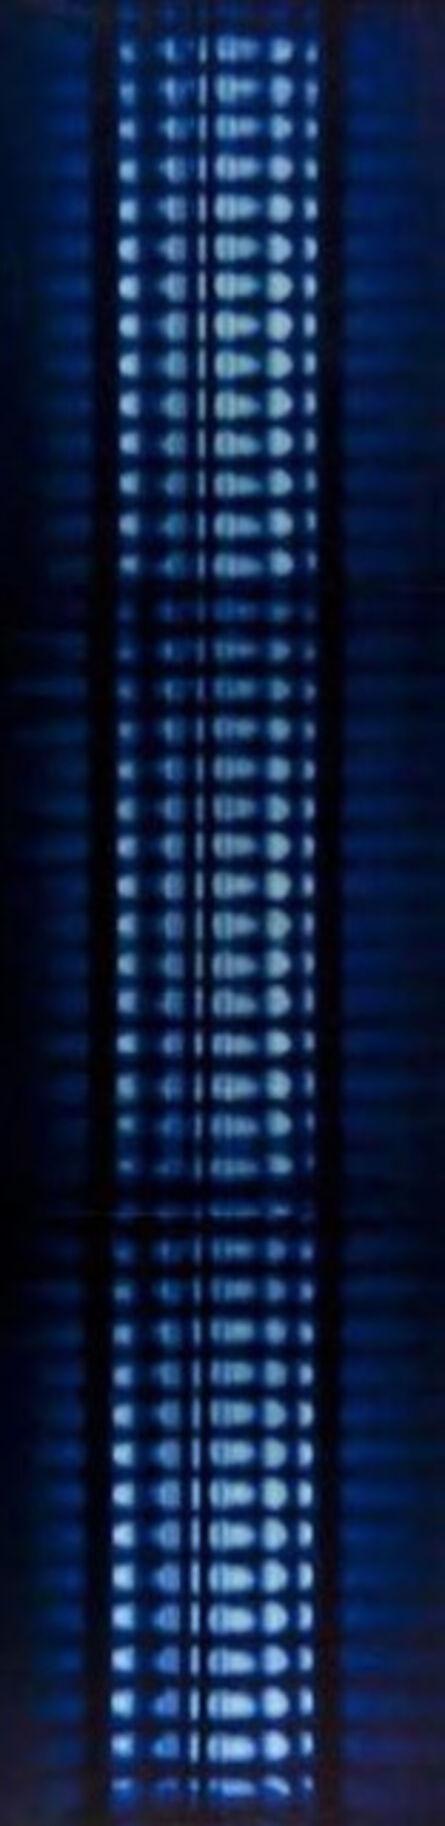 Garry Fabian Miller, 'Single Tower, Night Tower 12', 2002